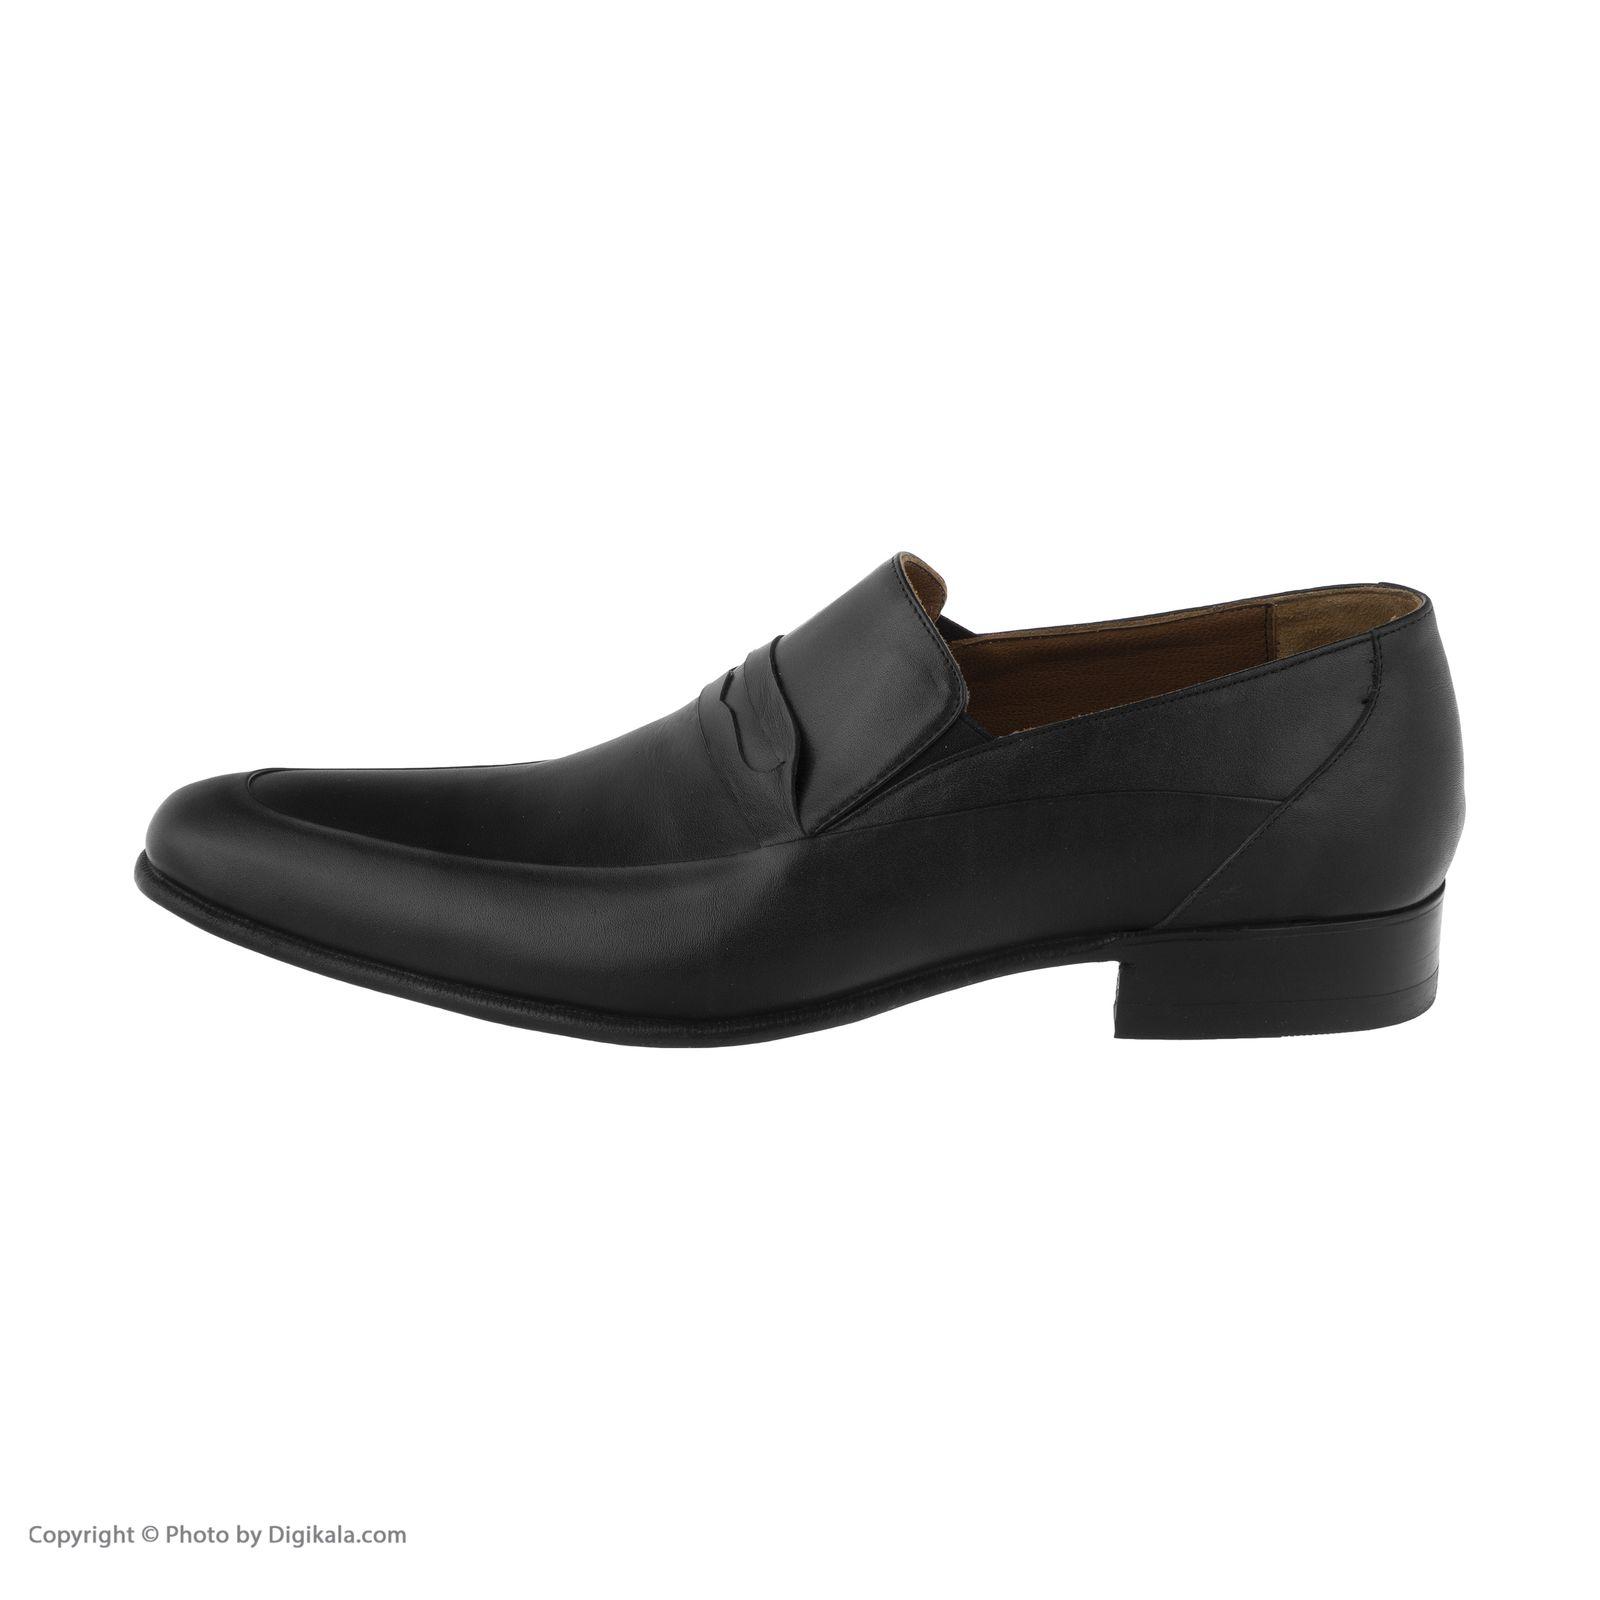 کفش مردانه نظری کد 421 -  - 1